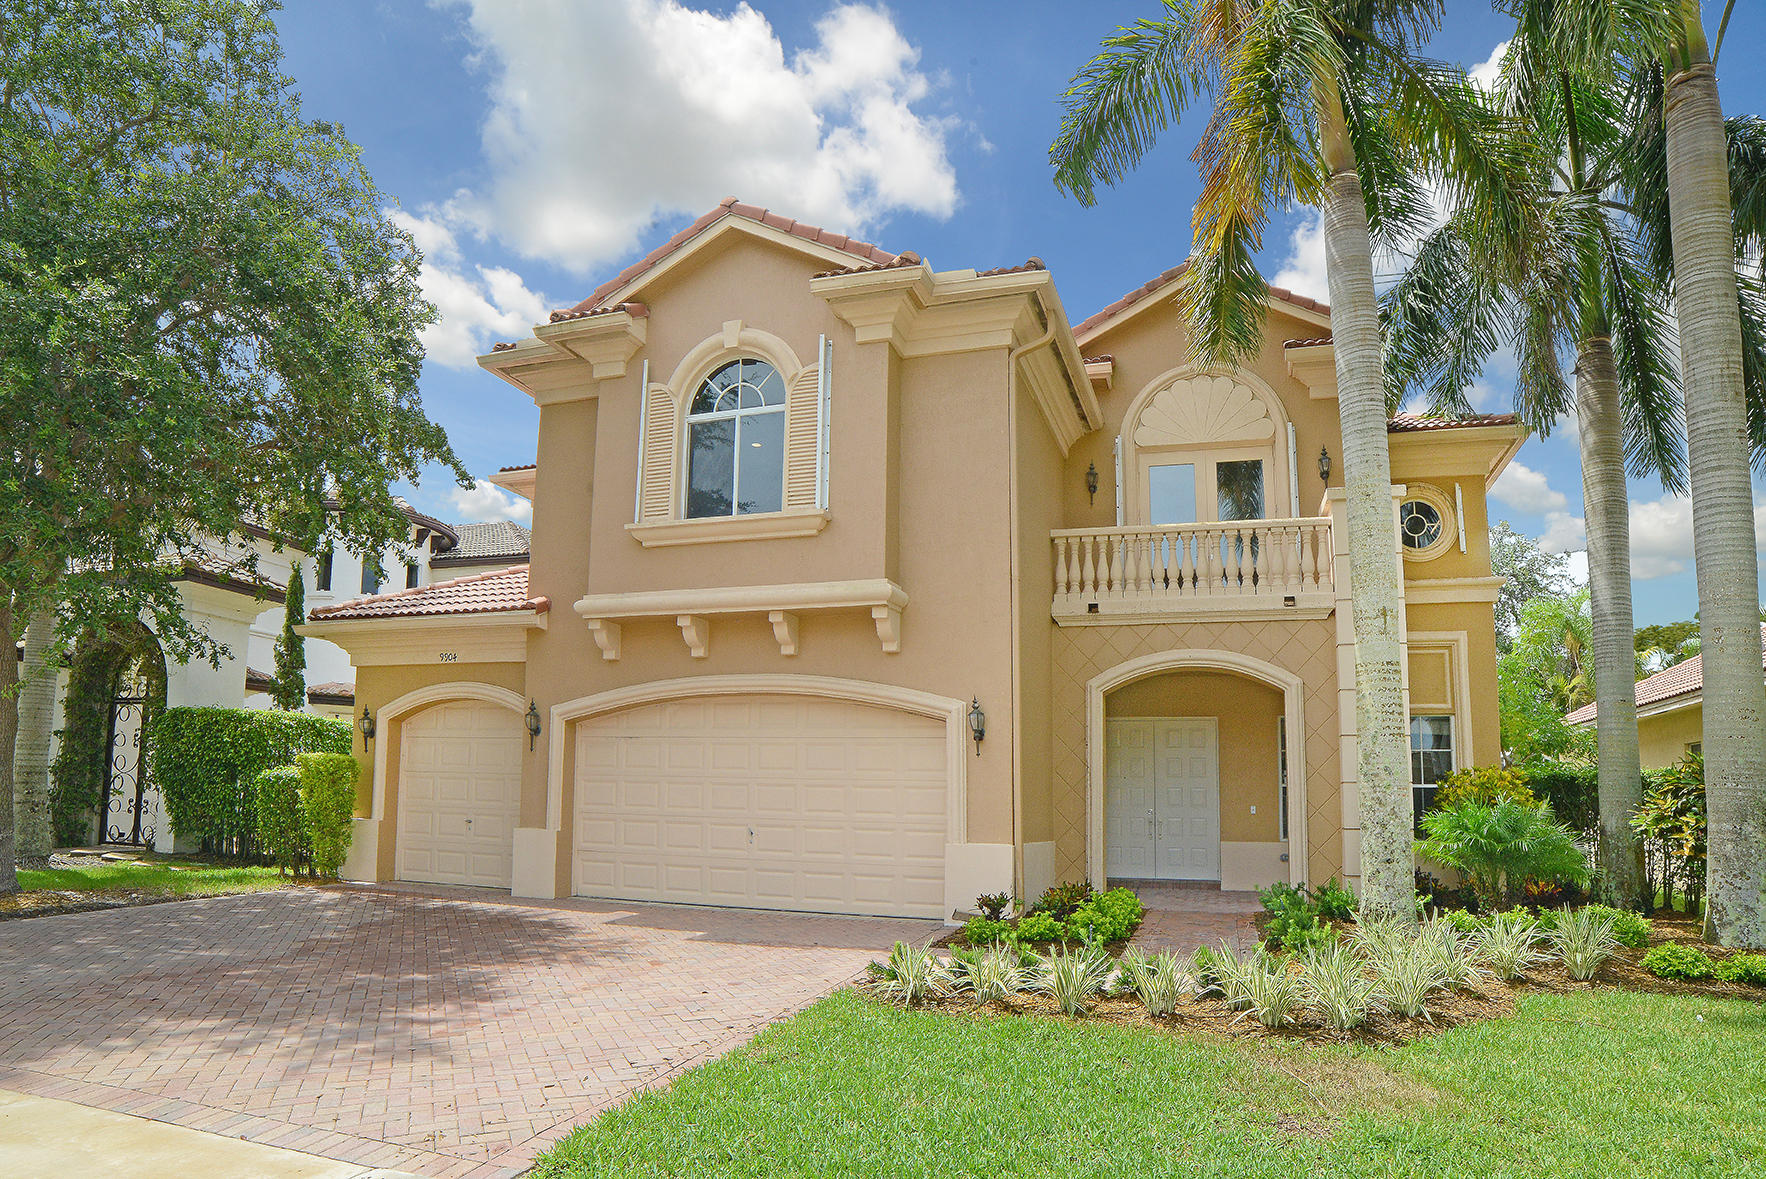 Home for sale in Palma Vista Boca Raton Florida